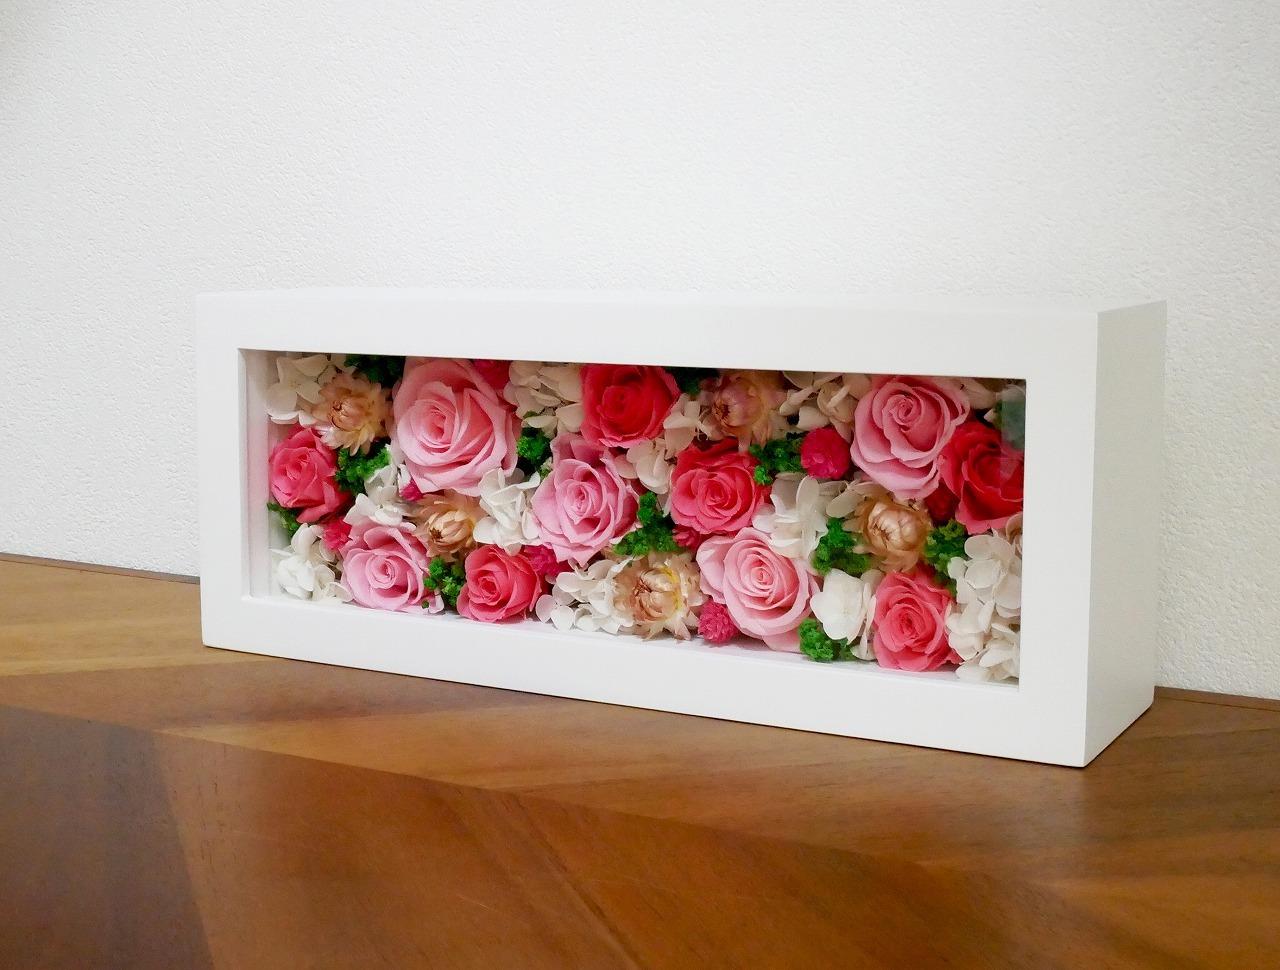 Framed preserved flower arrangement*Pink wide (フレーム入りアレンジメント*プリザーブドフラワー*横長ピンク)